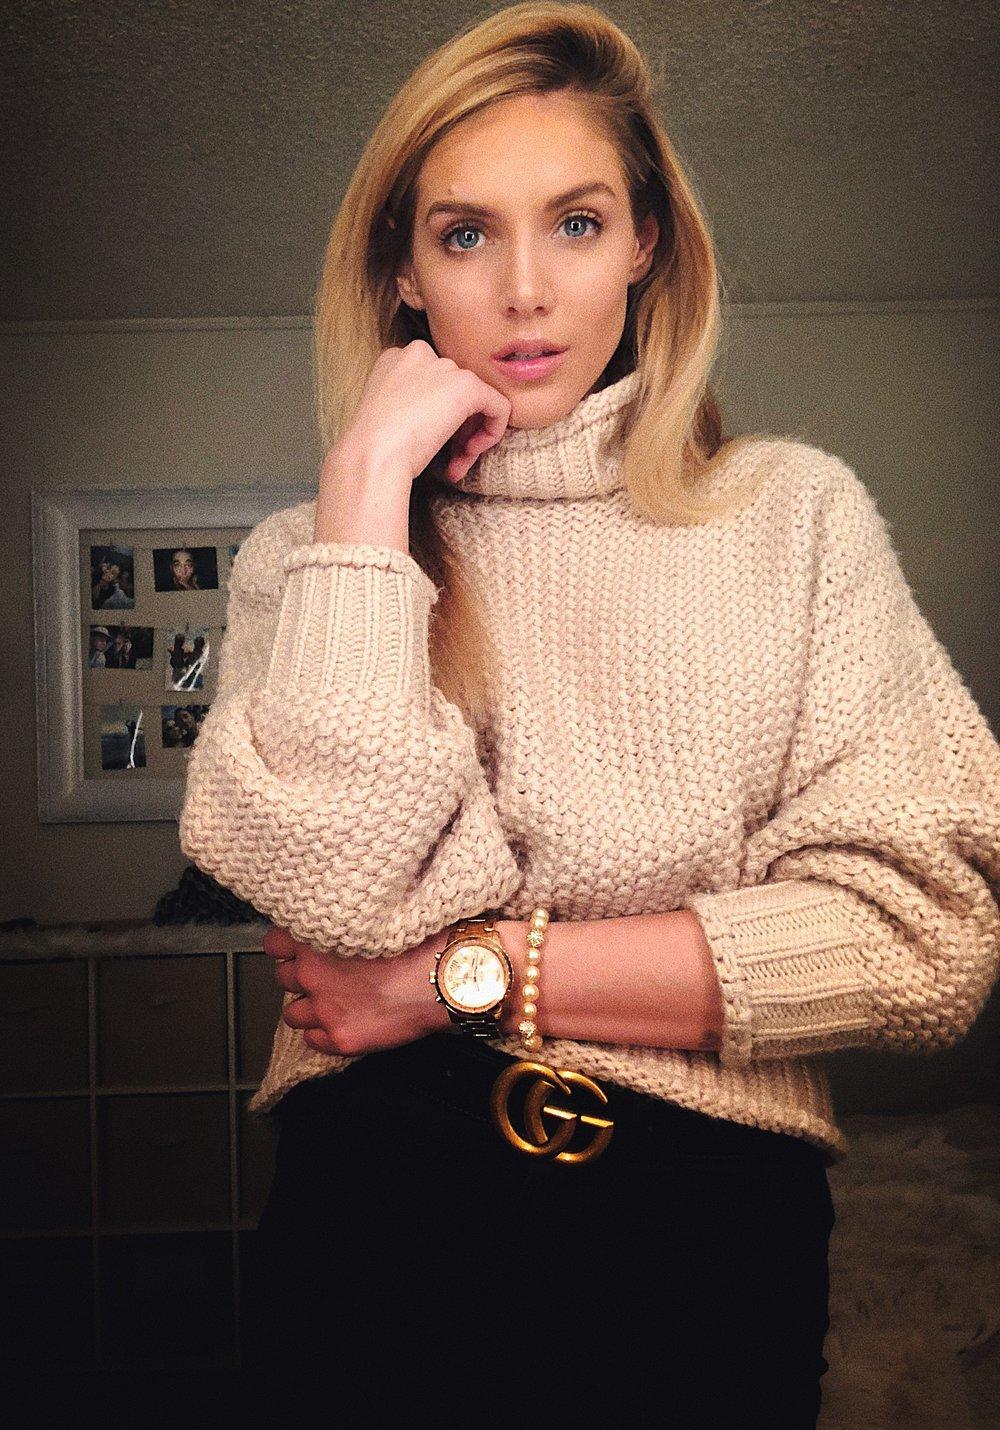 Monday - Sweater- H&MWatch- GuessBracelet- Trice JewelersBelt- GucciPants- Levis